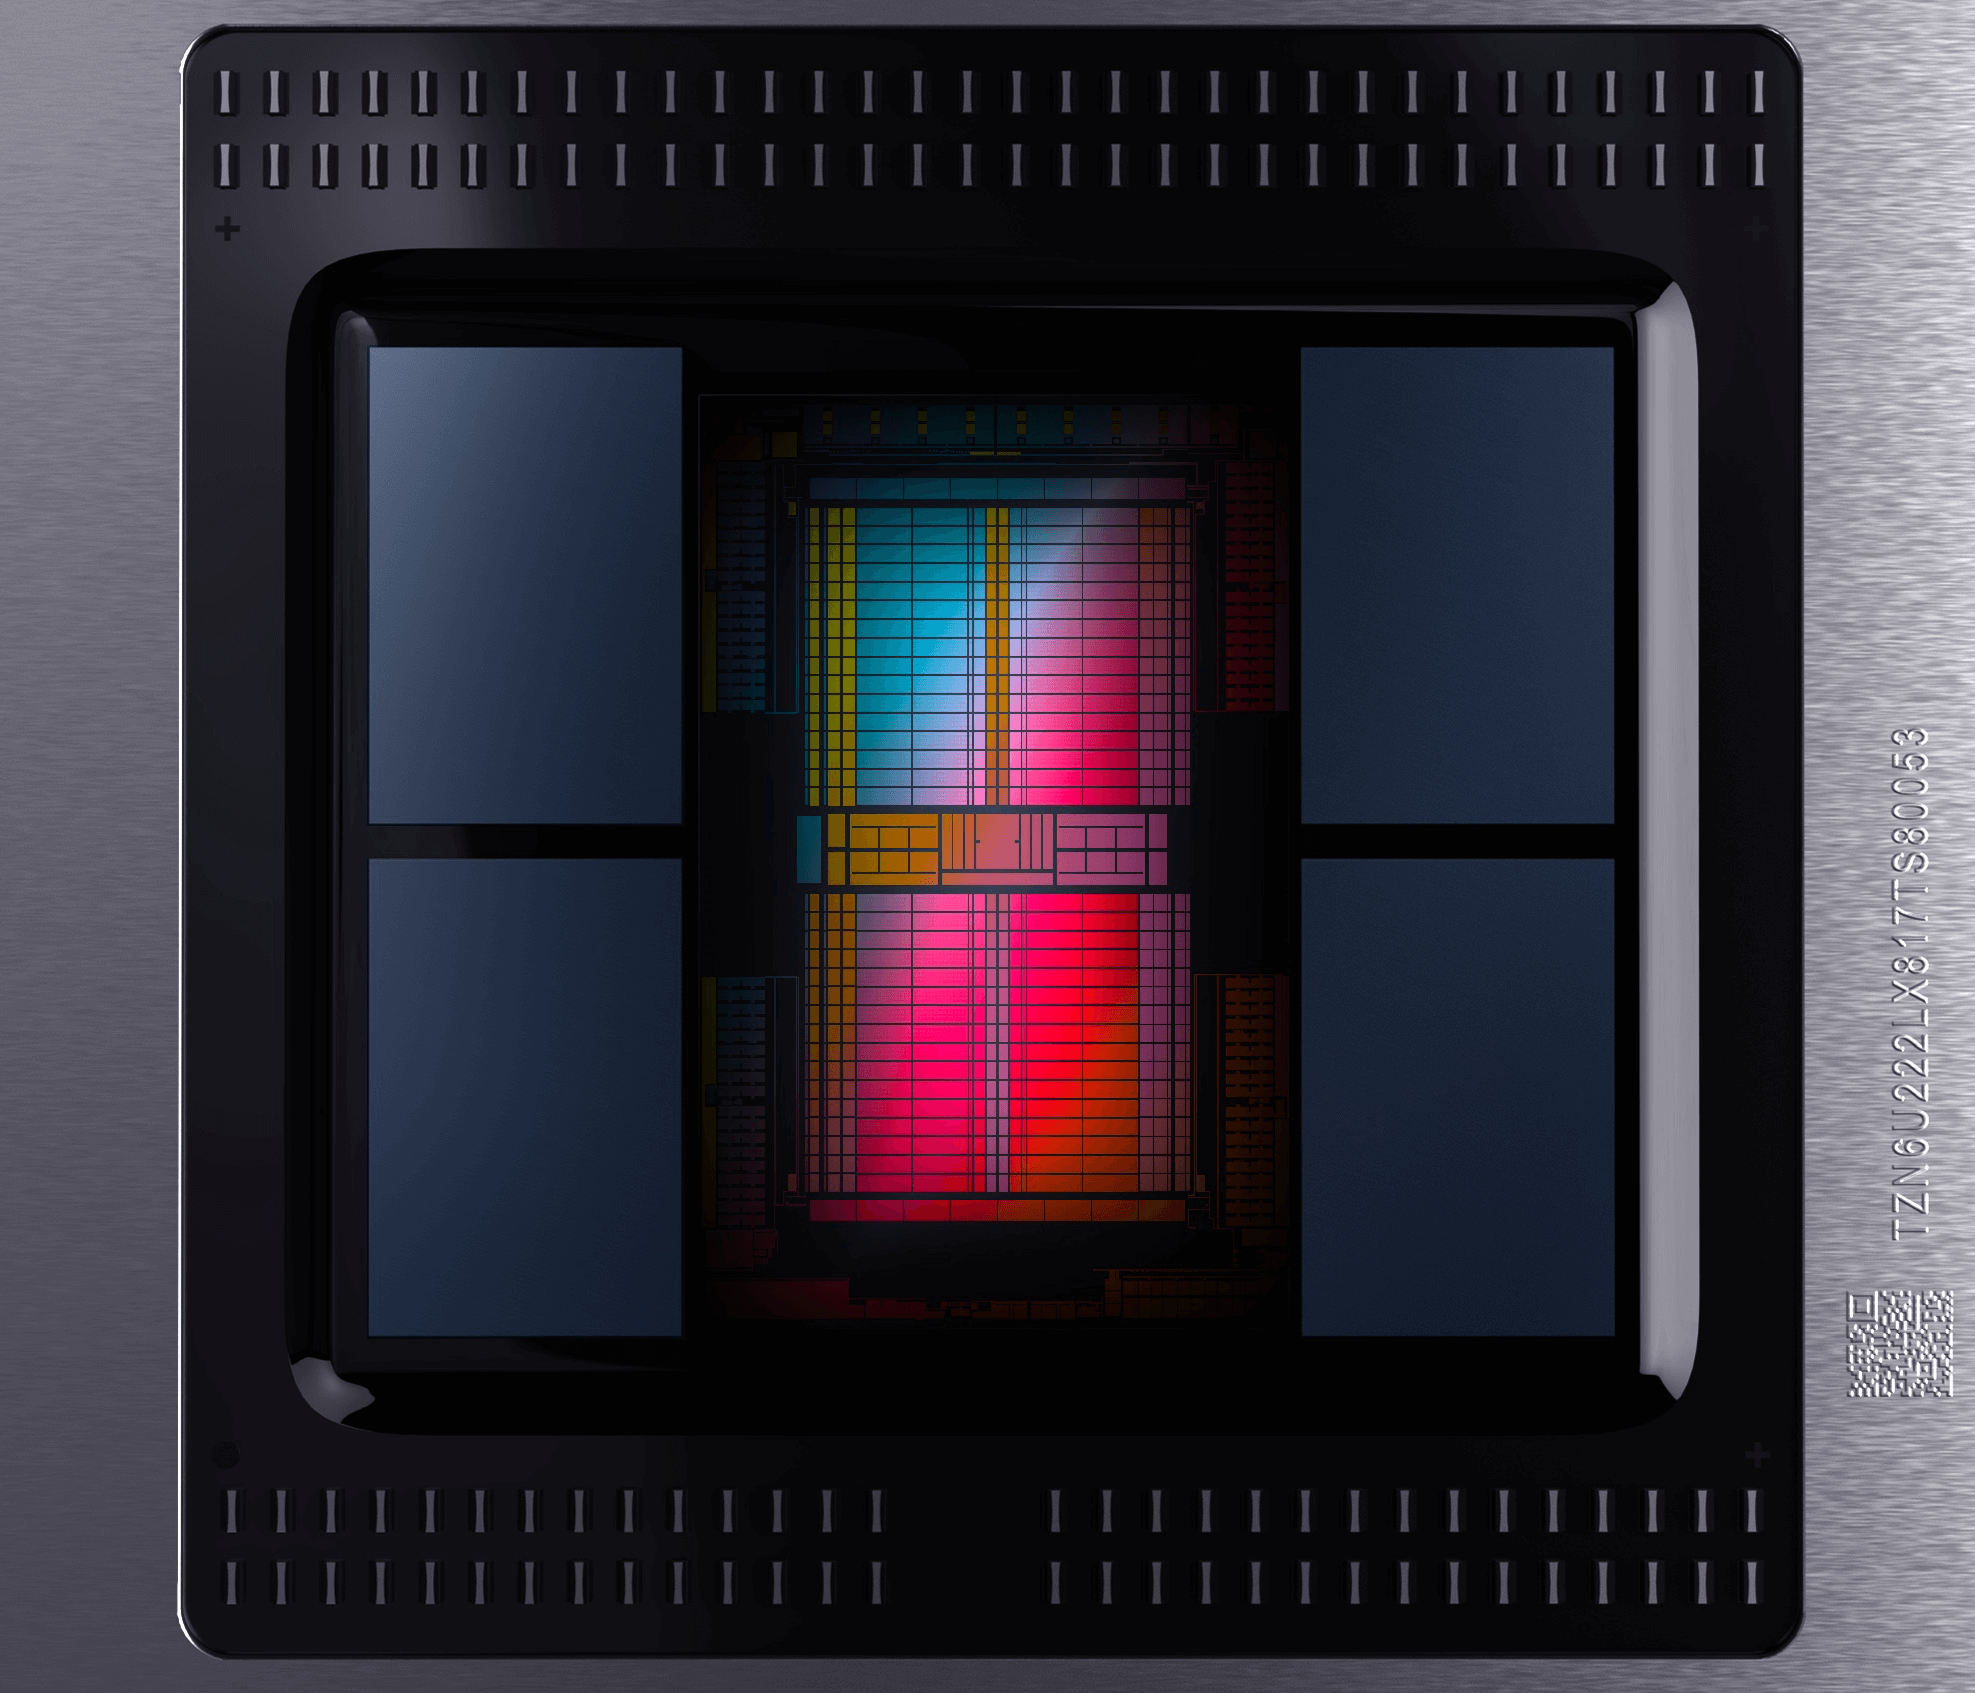 Radeon VII & GeForce RTX 2080 using Ryzen 7 2700X & Core i7